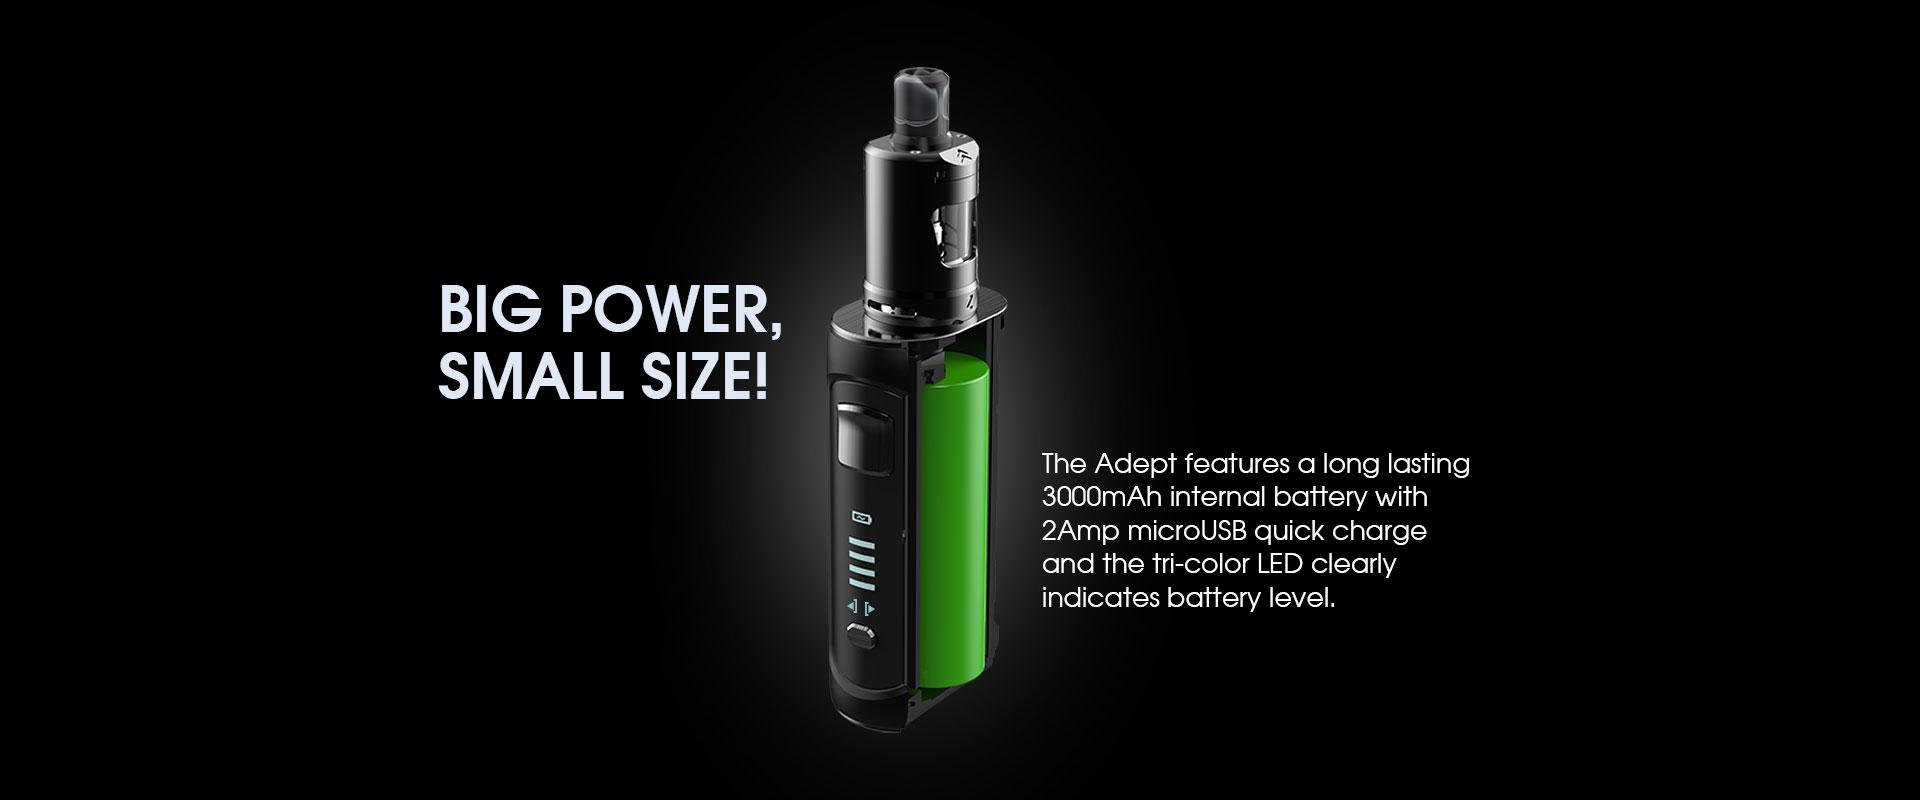 Innokin Adept battery